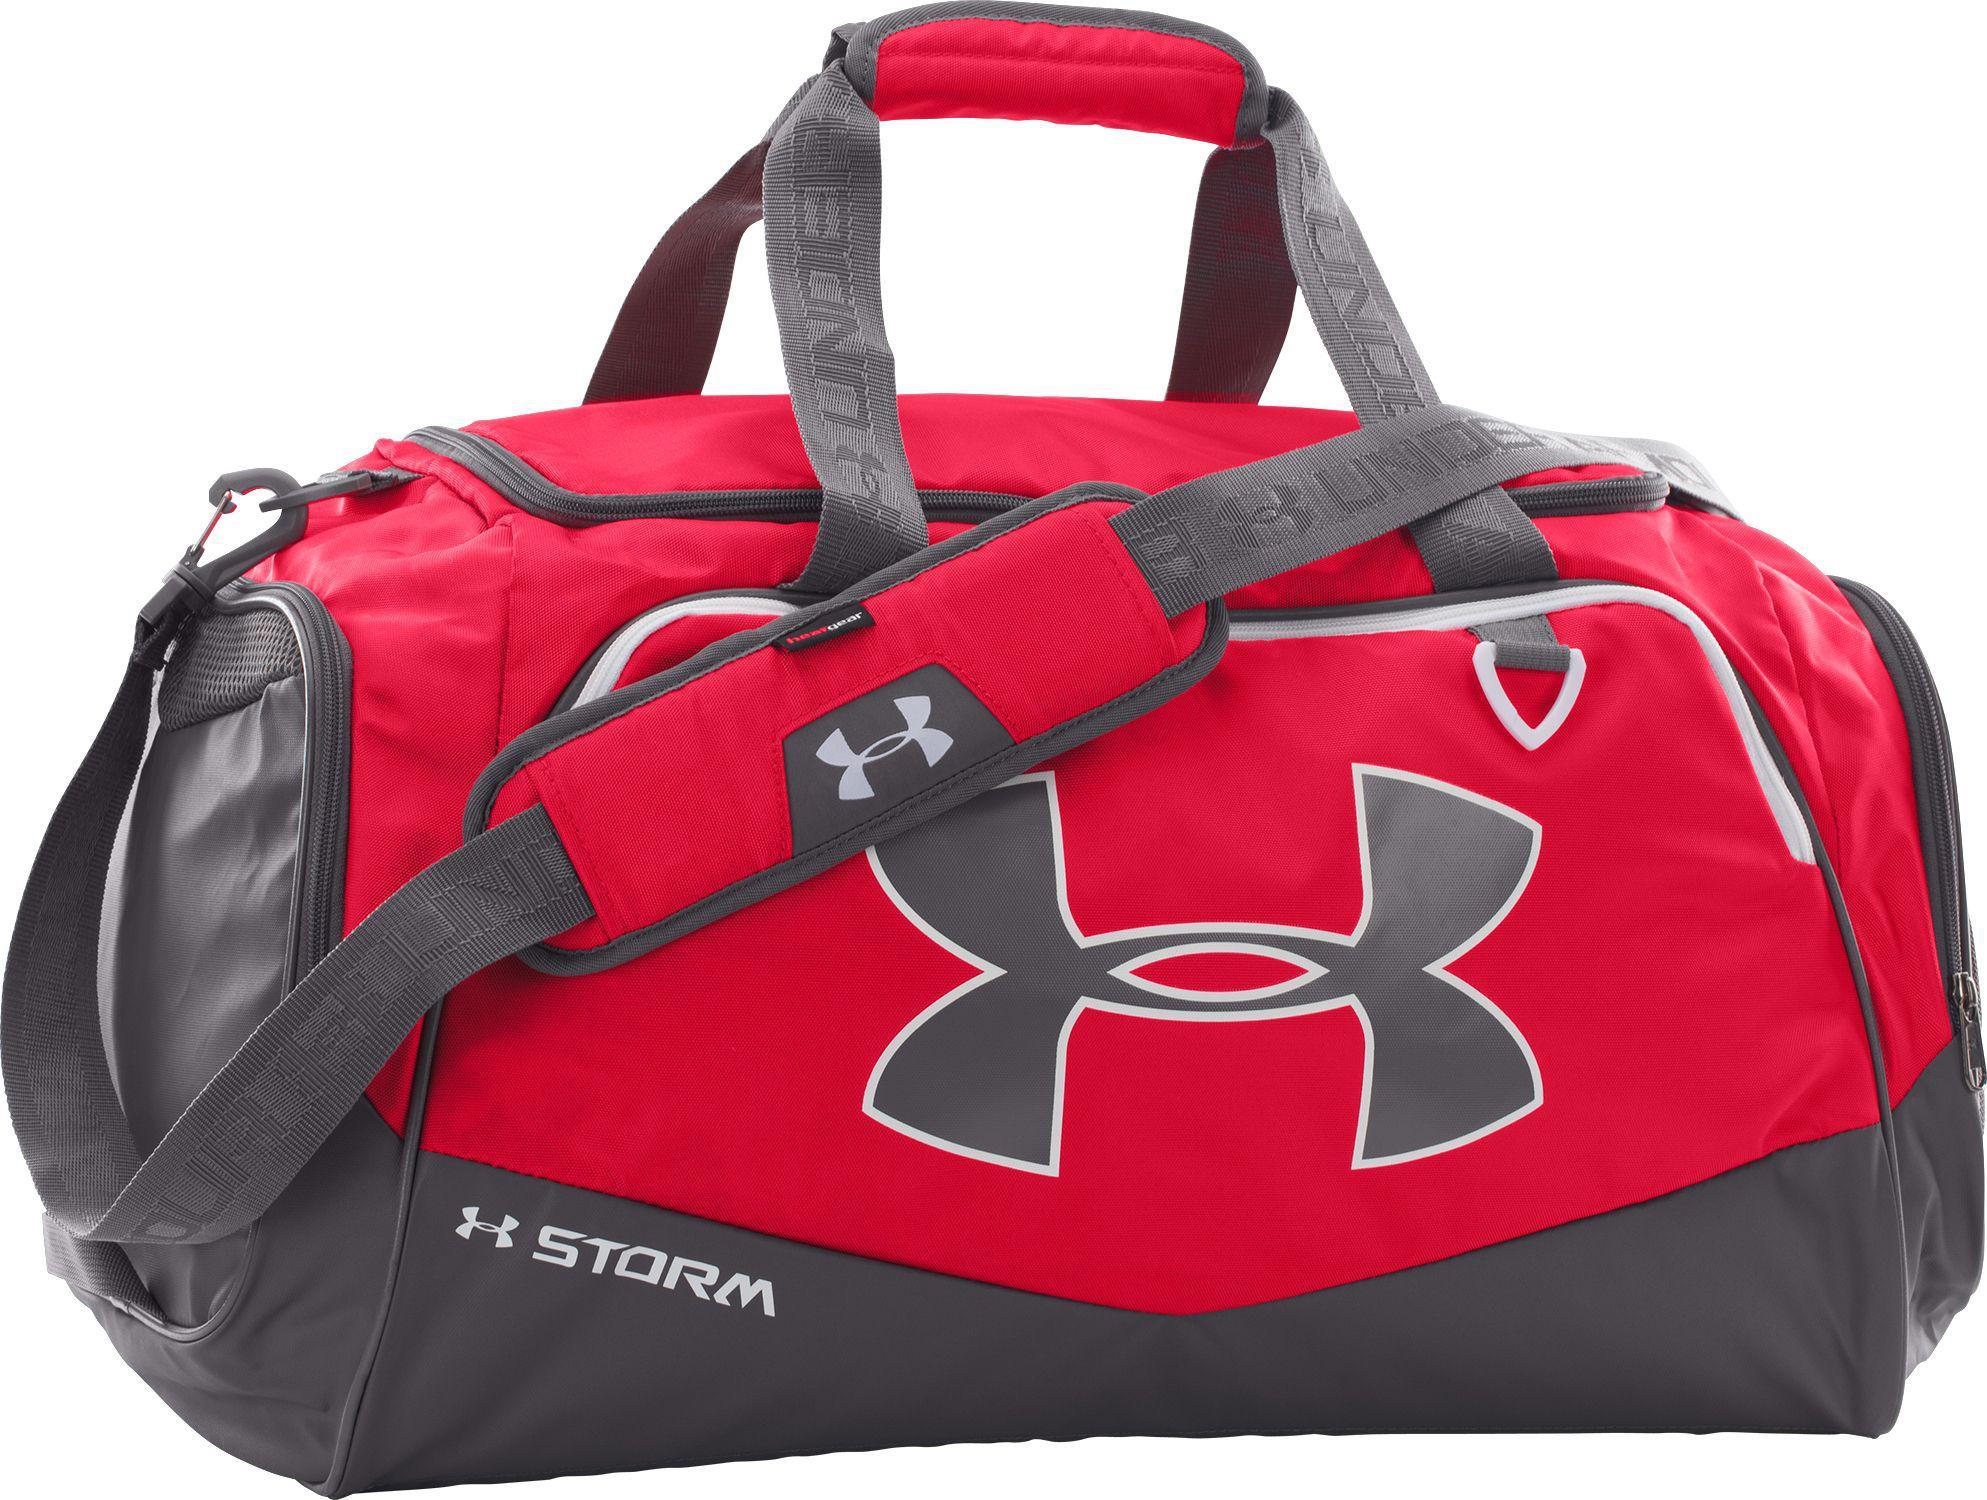 e13de8eada0 Lyst - Under Armour Undeniable Ii Medium Duffle Bag in Red for Men